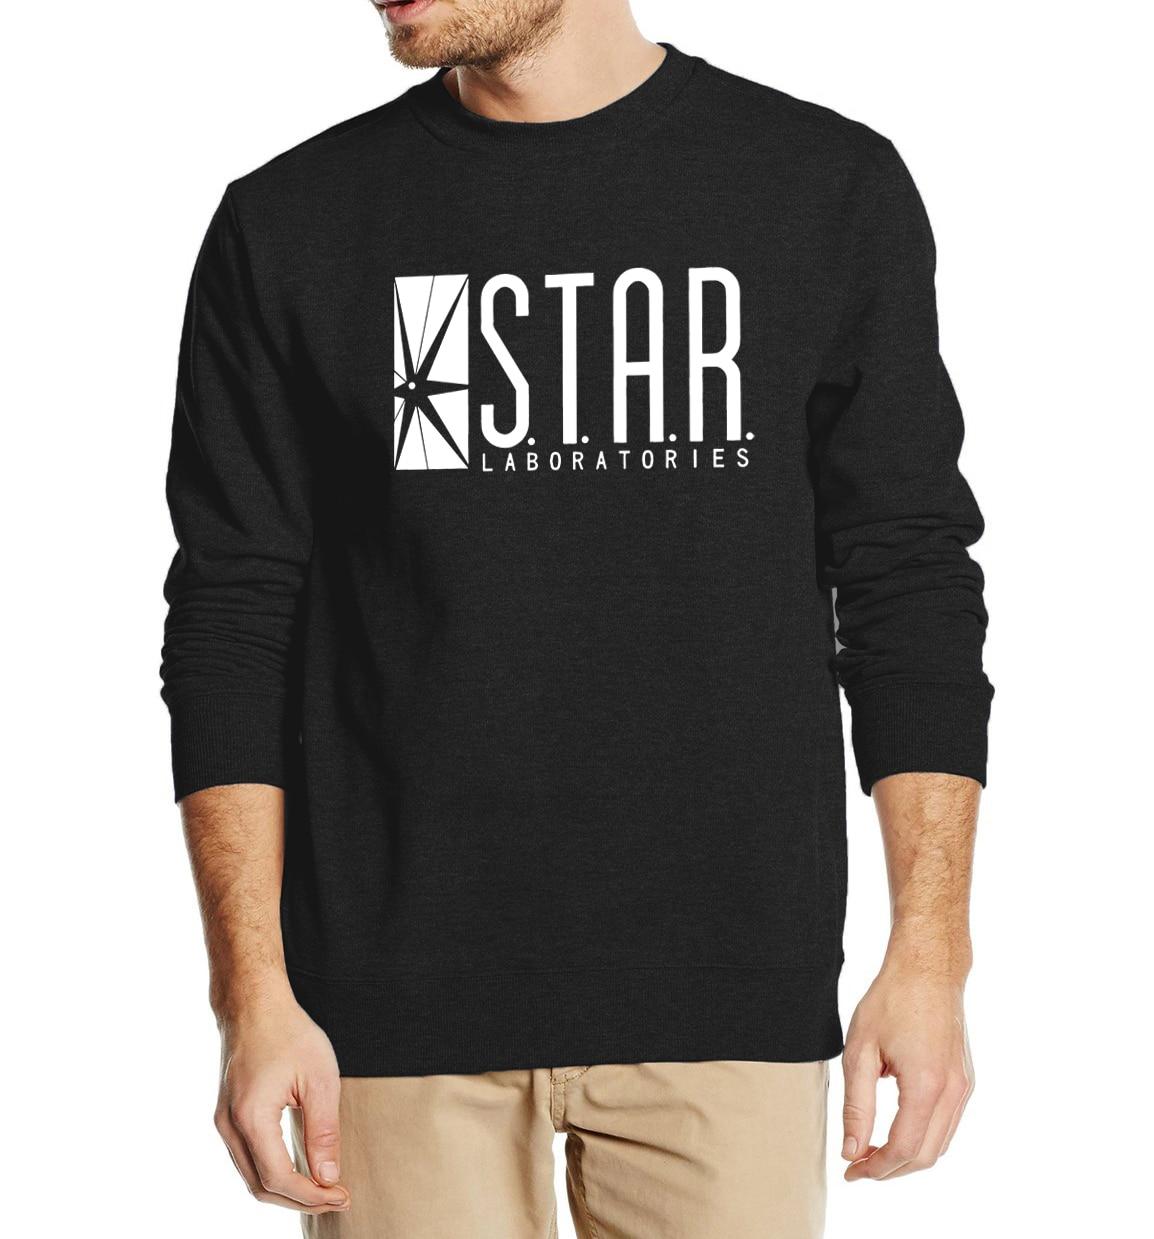 Superman Series Men Sweatshirt STAR S.T.A.R.labs autumn winter  2018 new fashion hoodies cool streetwear tracksuit high quality